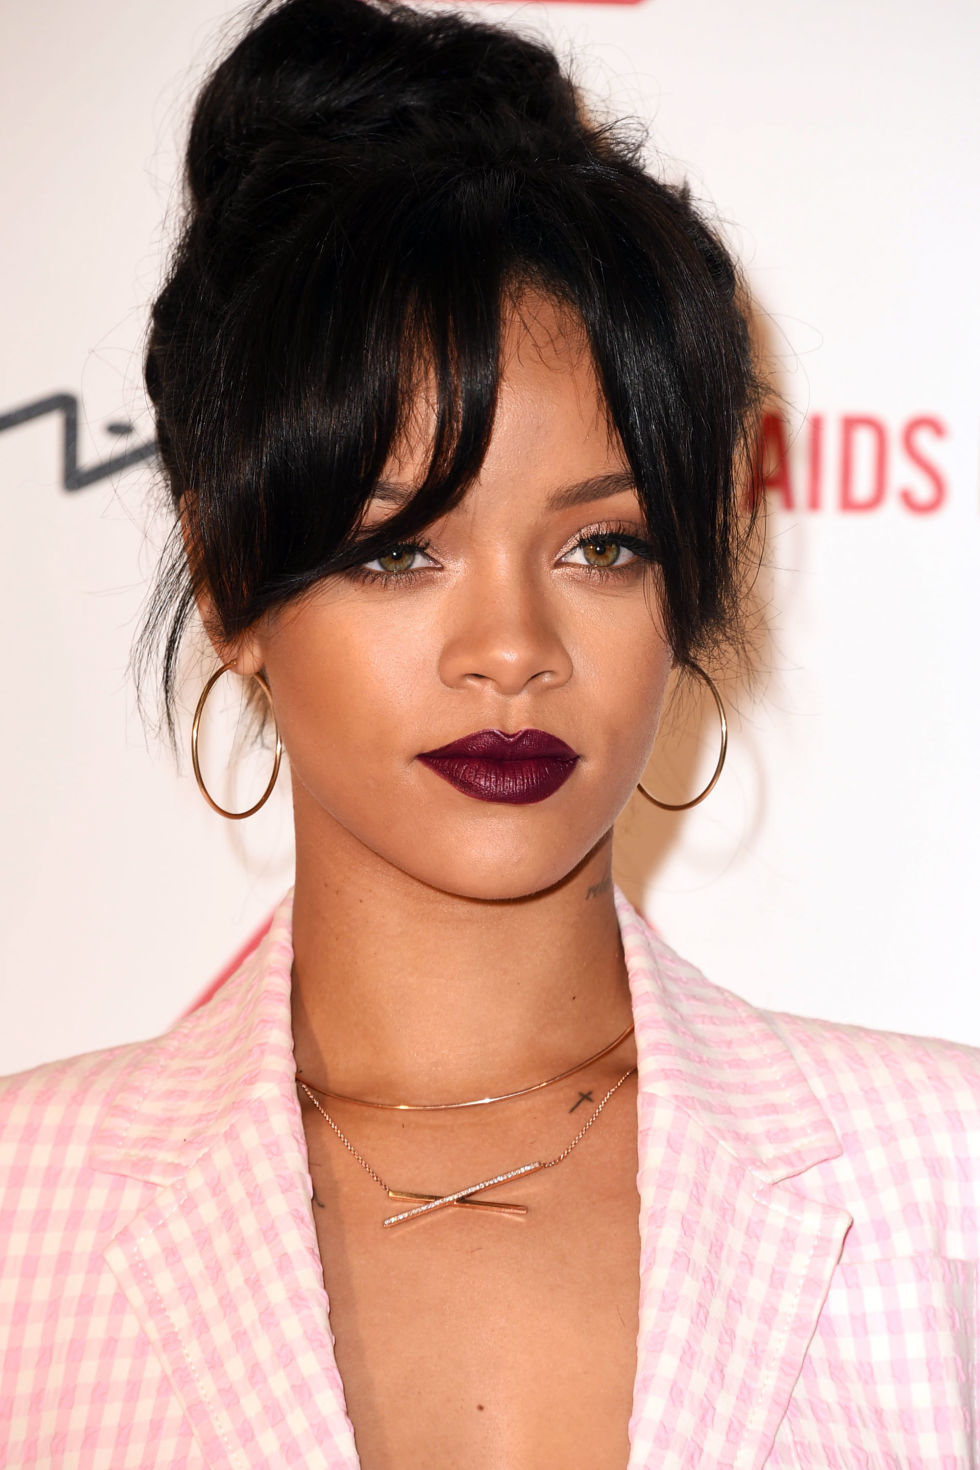 54bc45200241c_-_hbz-best-lipsticks-2014-burgundy-rihanna-459208208